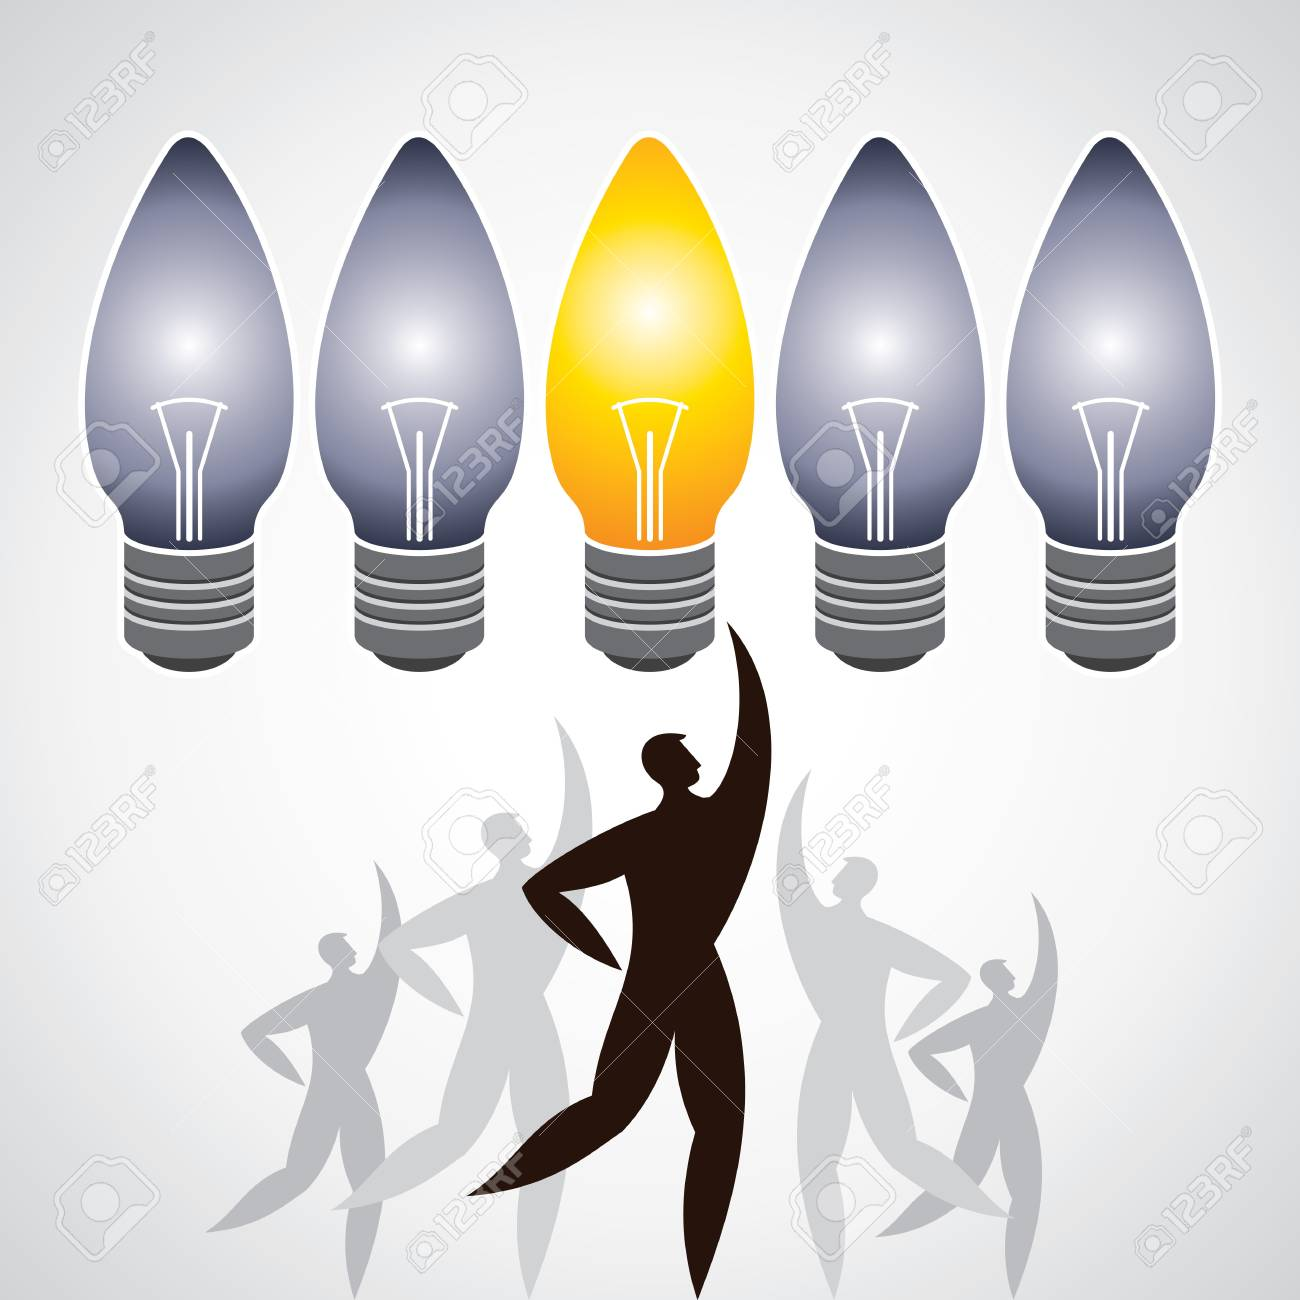 Illustration of man surround with idea bulbs Stock Vector - 17725787